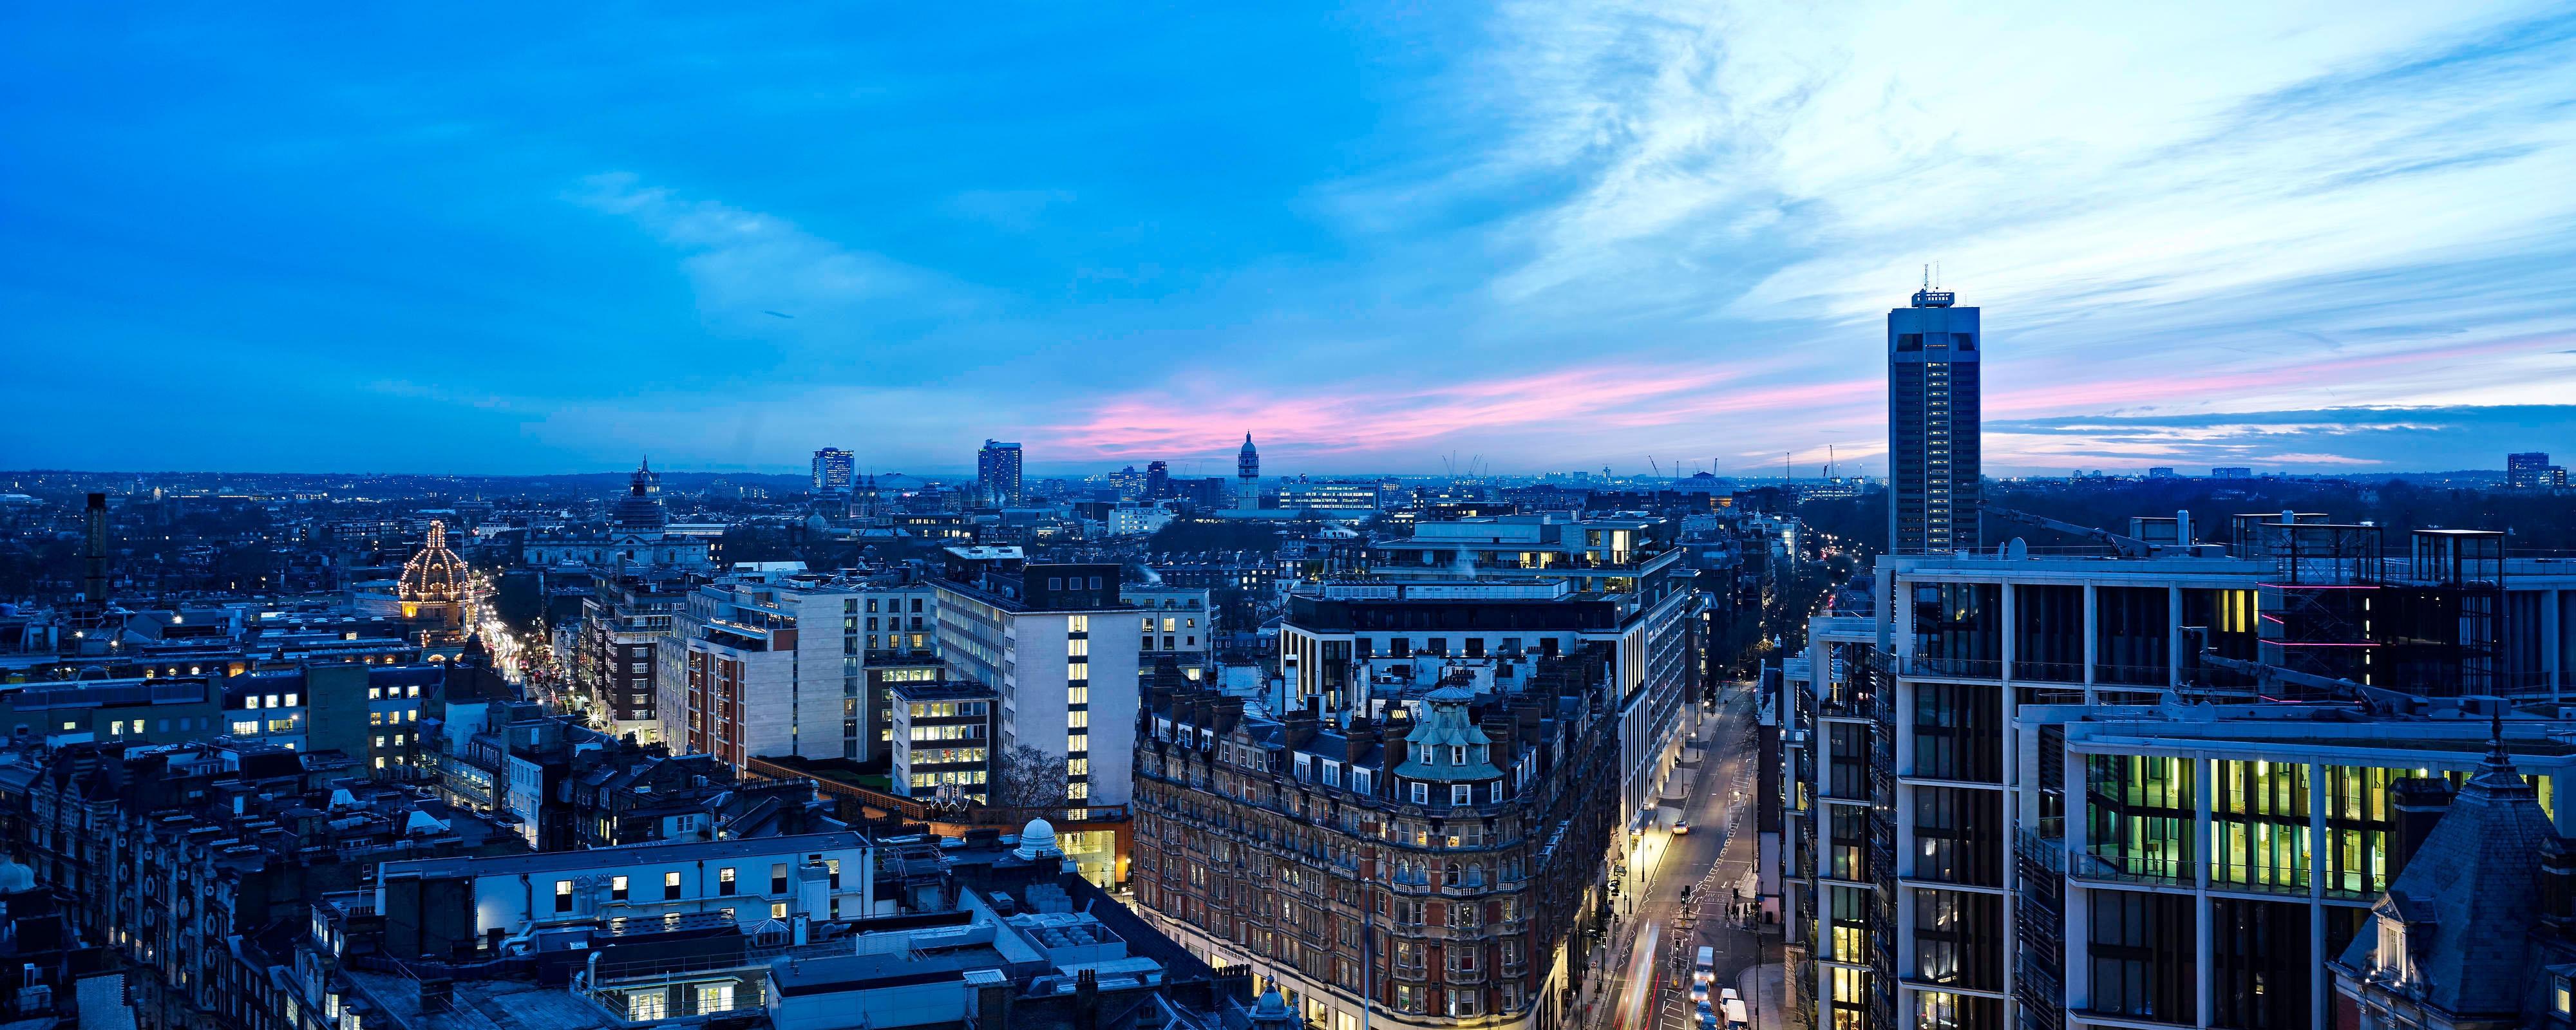 View of Knightsbridge